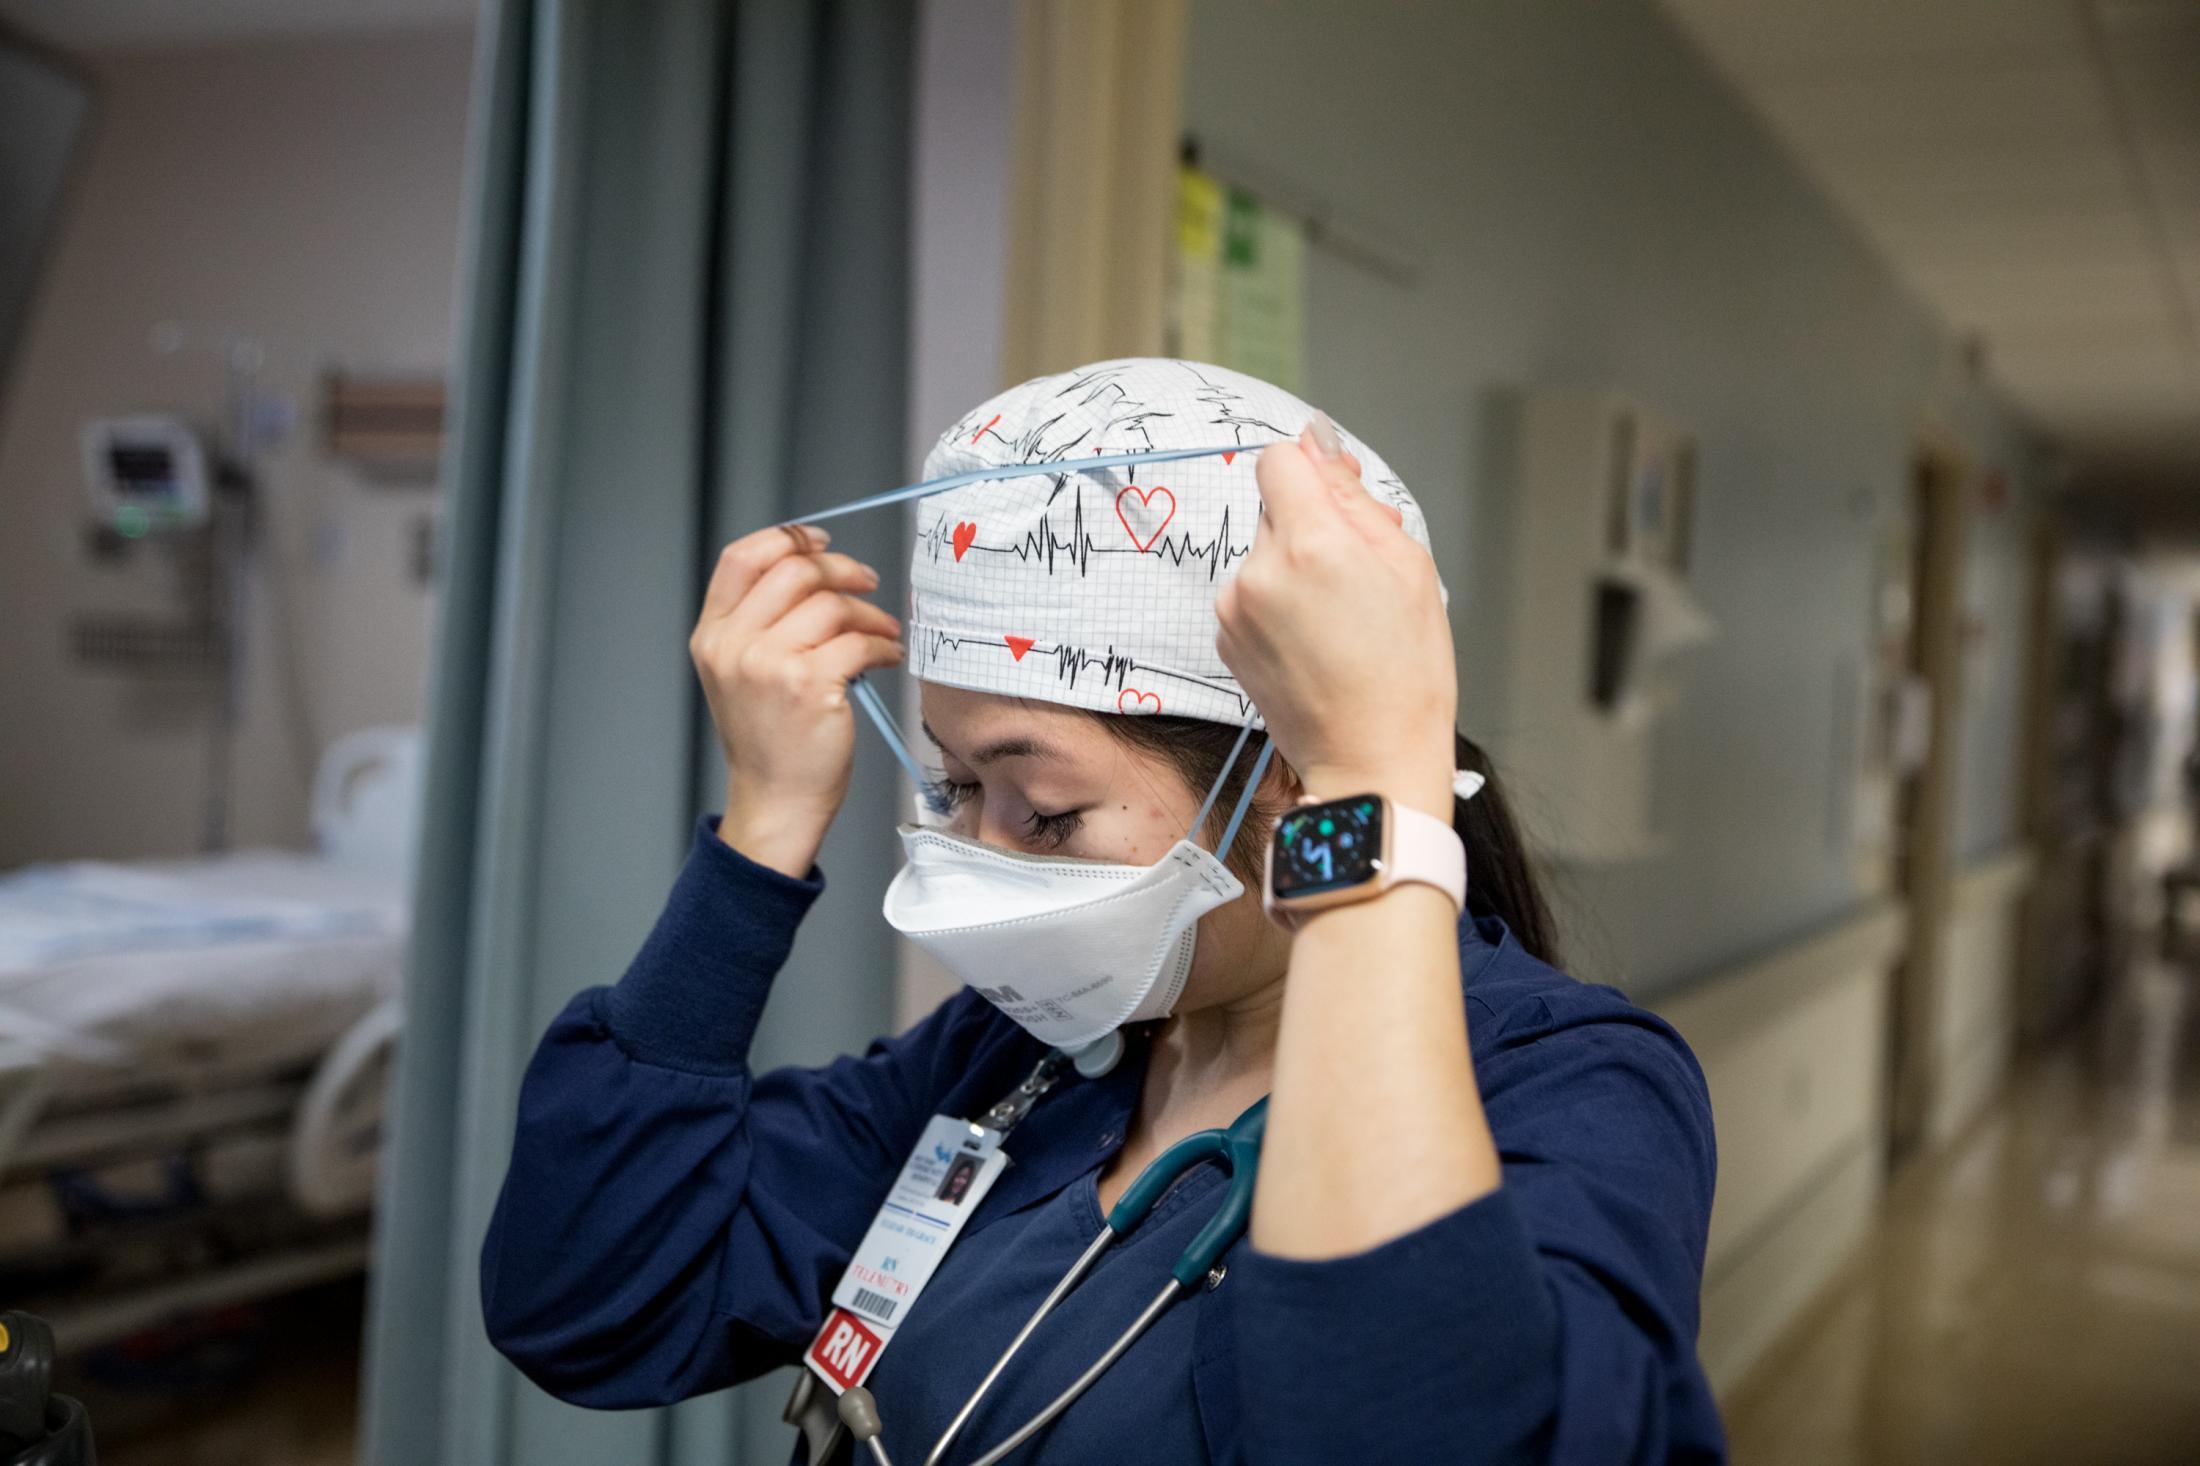 Elizabeth Grace Capadngan is a night shift telemetry nurse at Doctors Community Hospital.